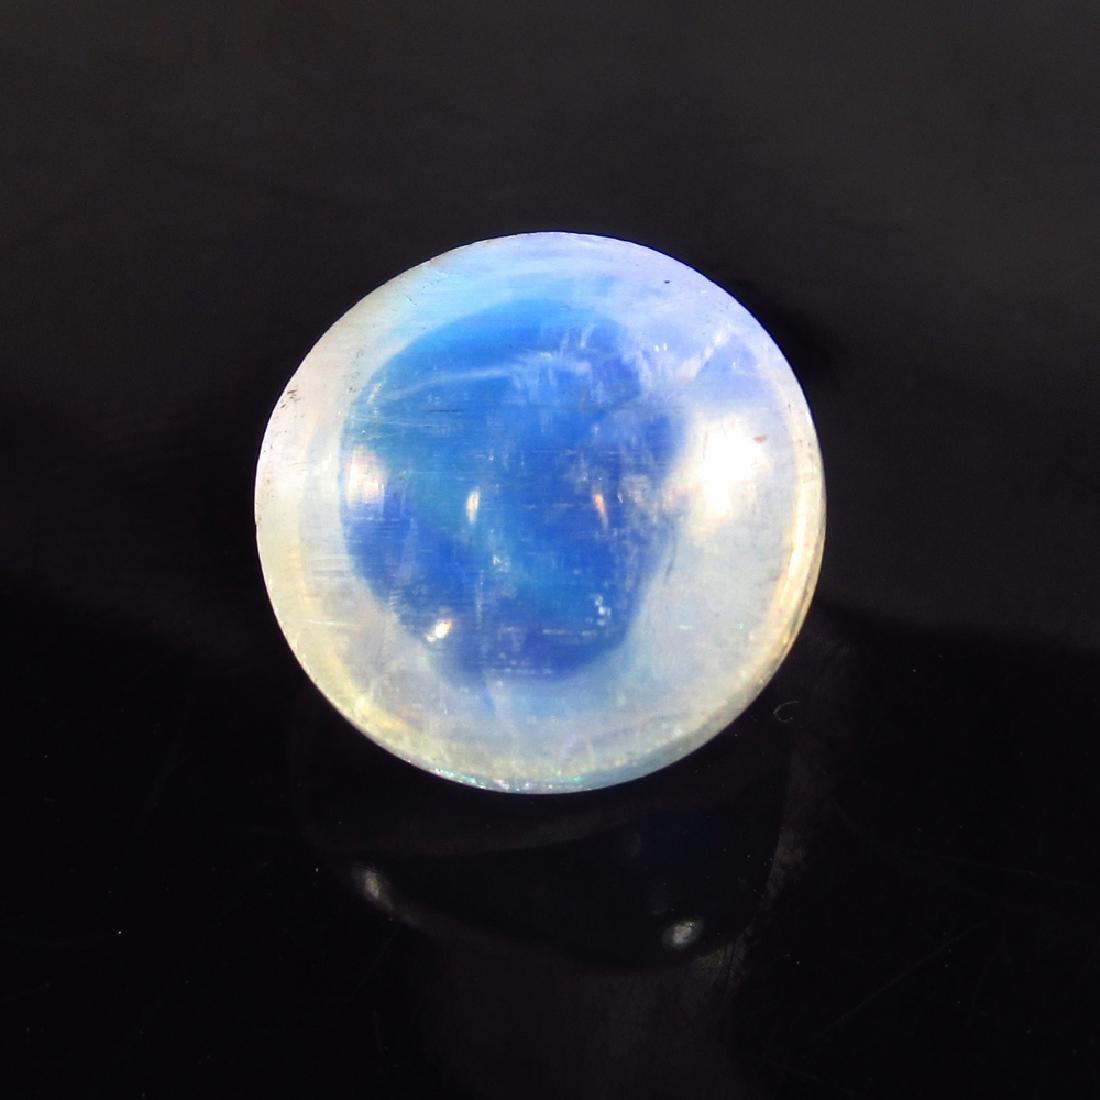 5.59 Ct Genuine Blue Moonstone 11 mm Round Cabochon Top - 2